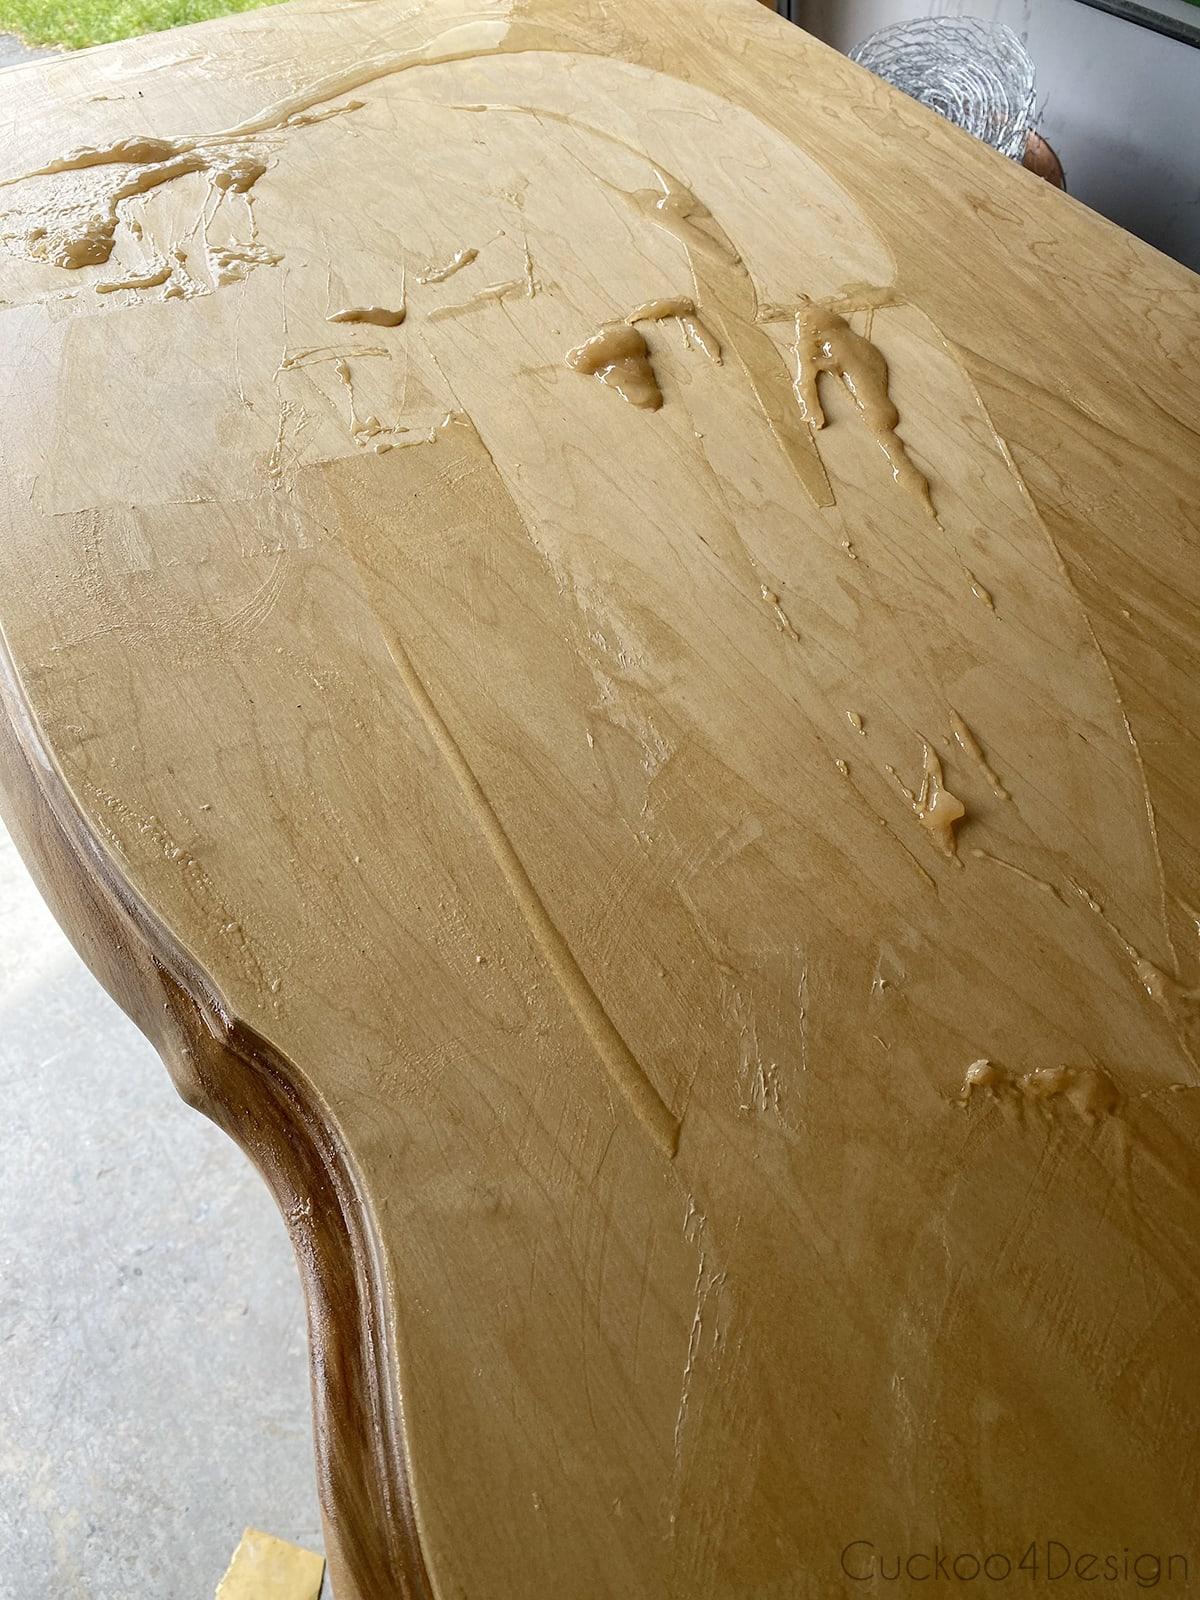 stripping off more varnish